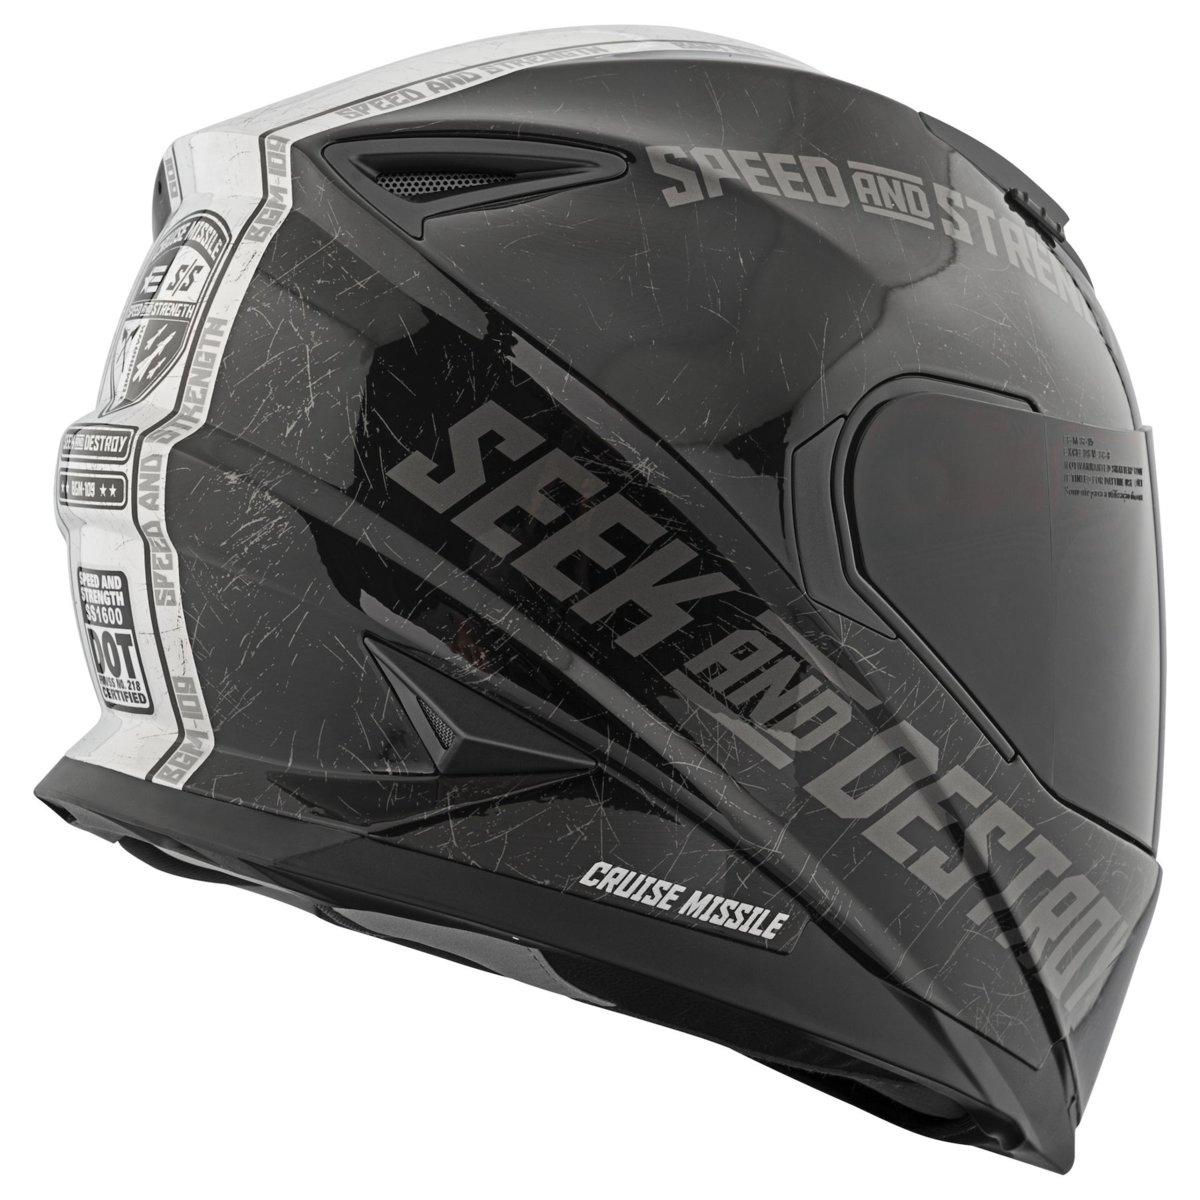 speedand_strength_ss1600_cruise_missile_helmet_1800x1800.jpg